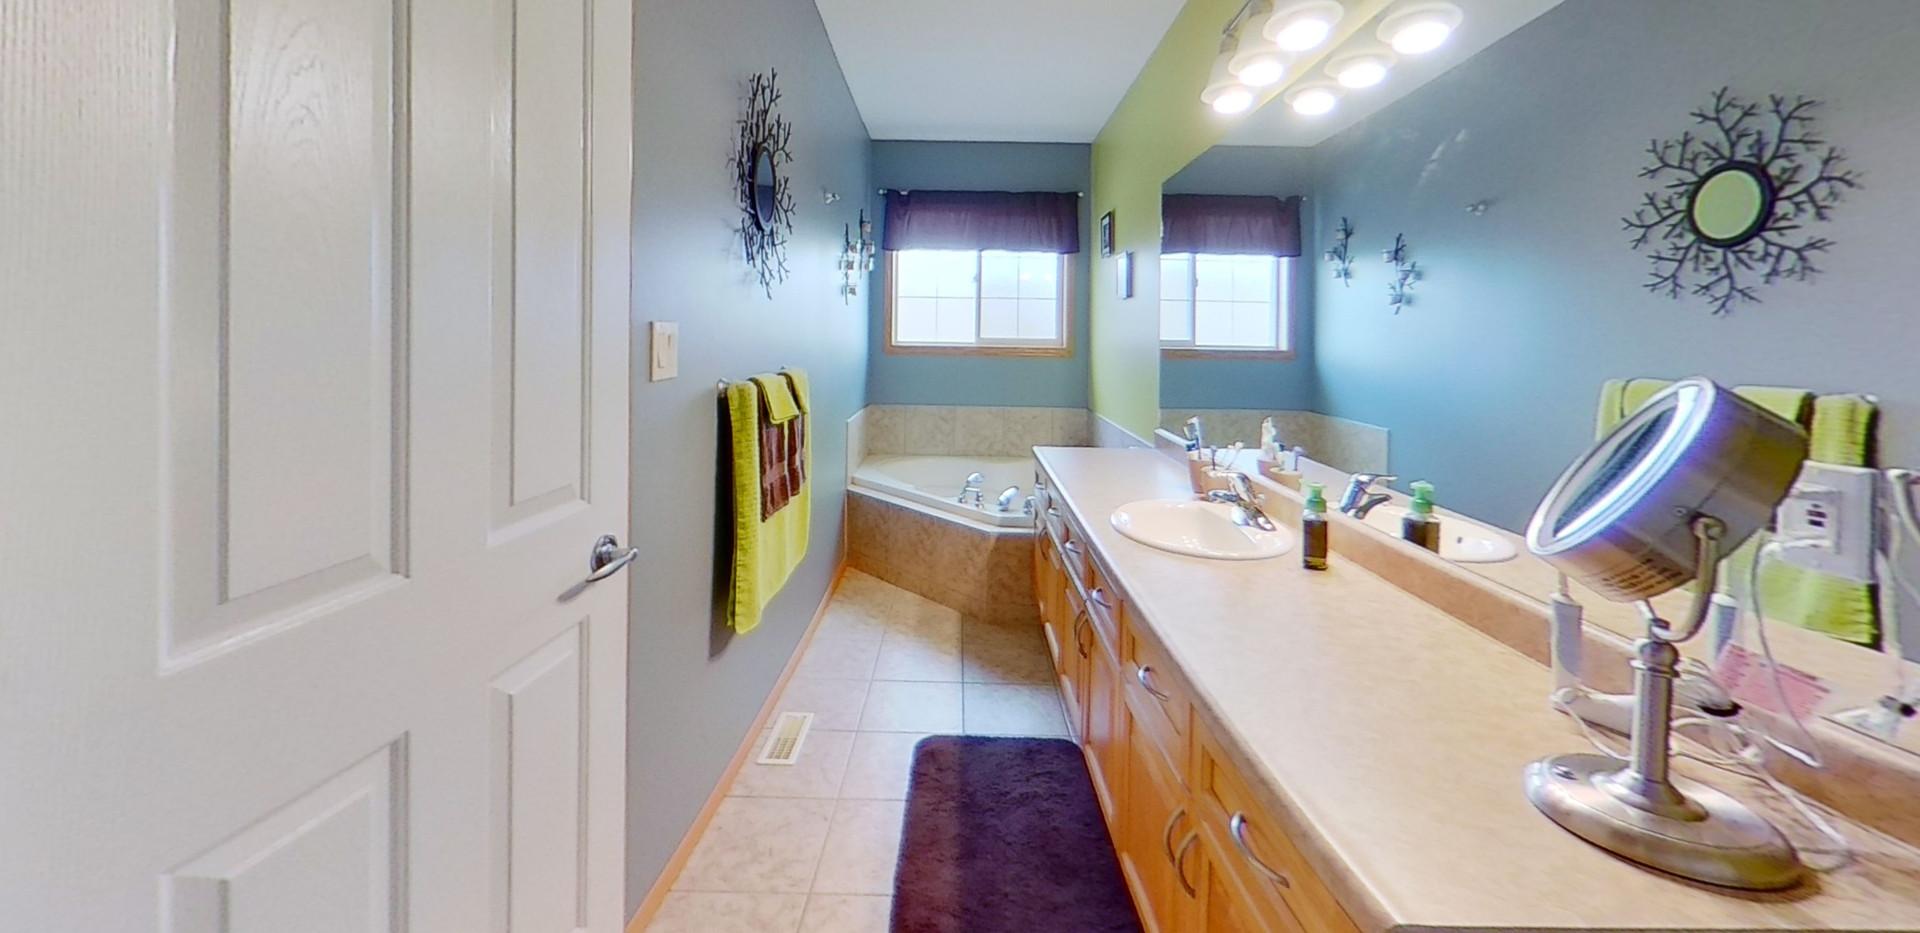 1143-Oakland-Dr-Bathroom.jpg